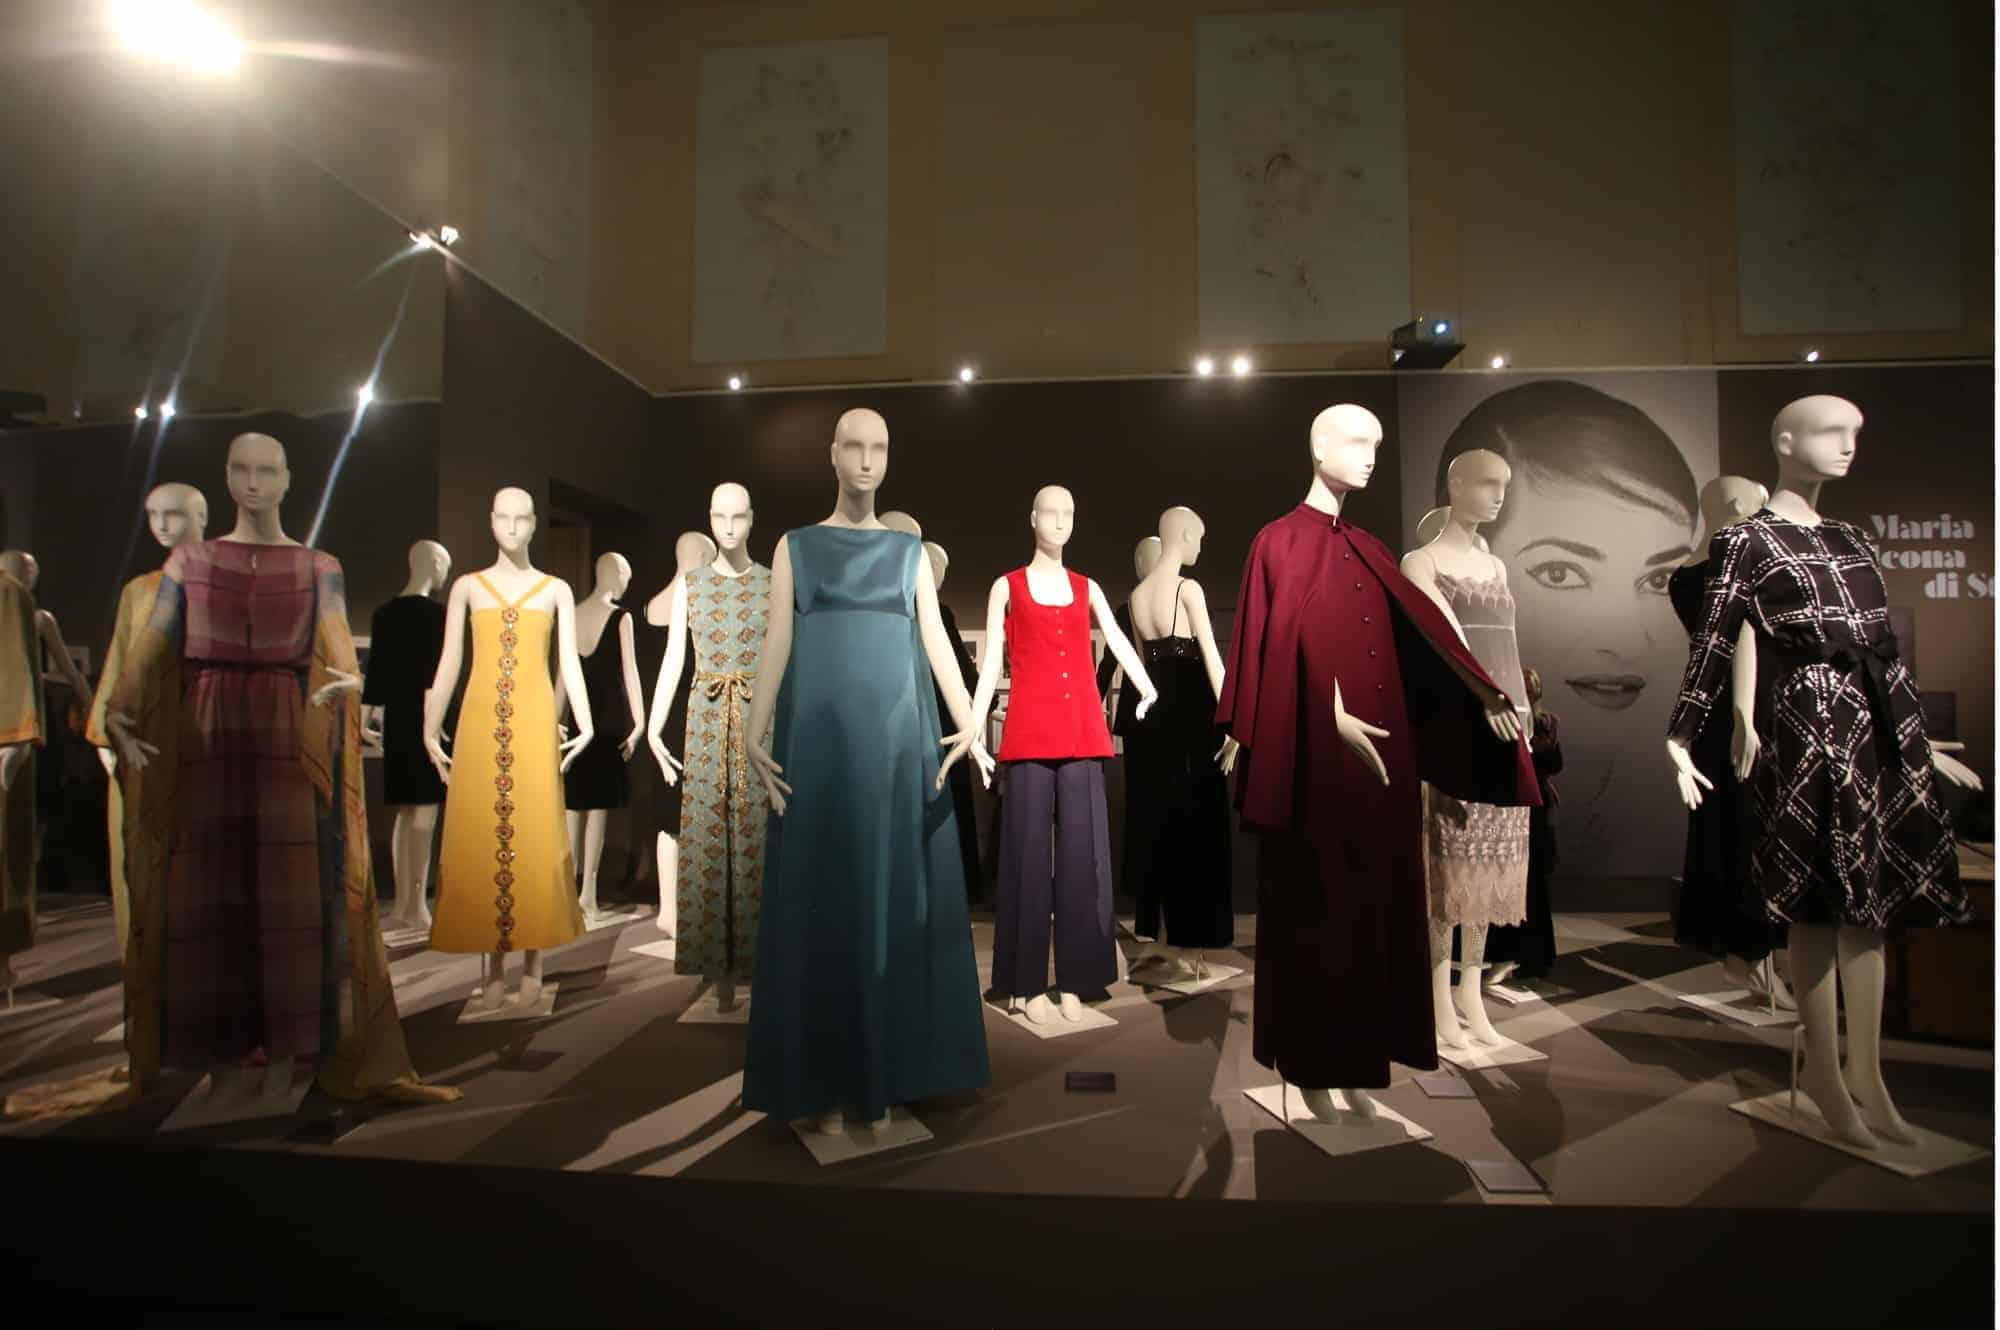 Exhibition of the life of Maria Callas features Schläppi 2200 mannequins